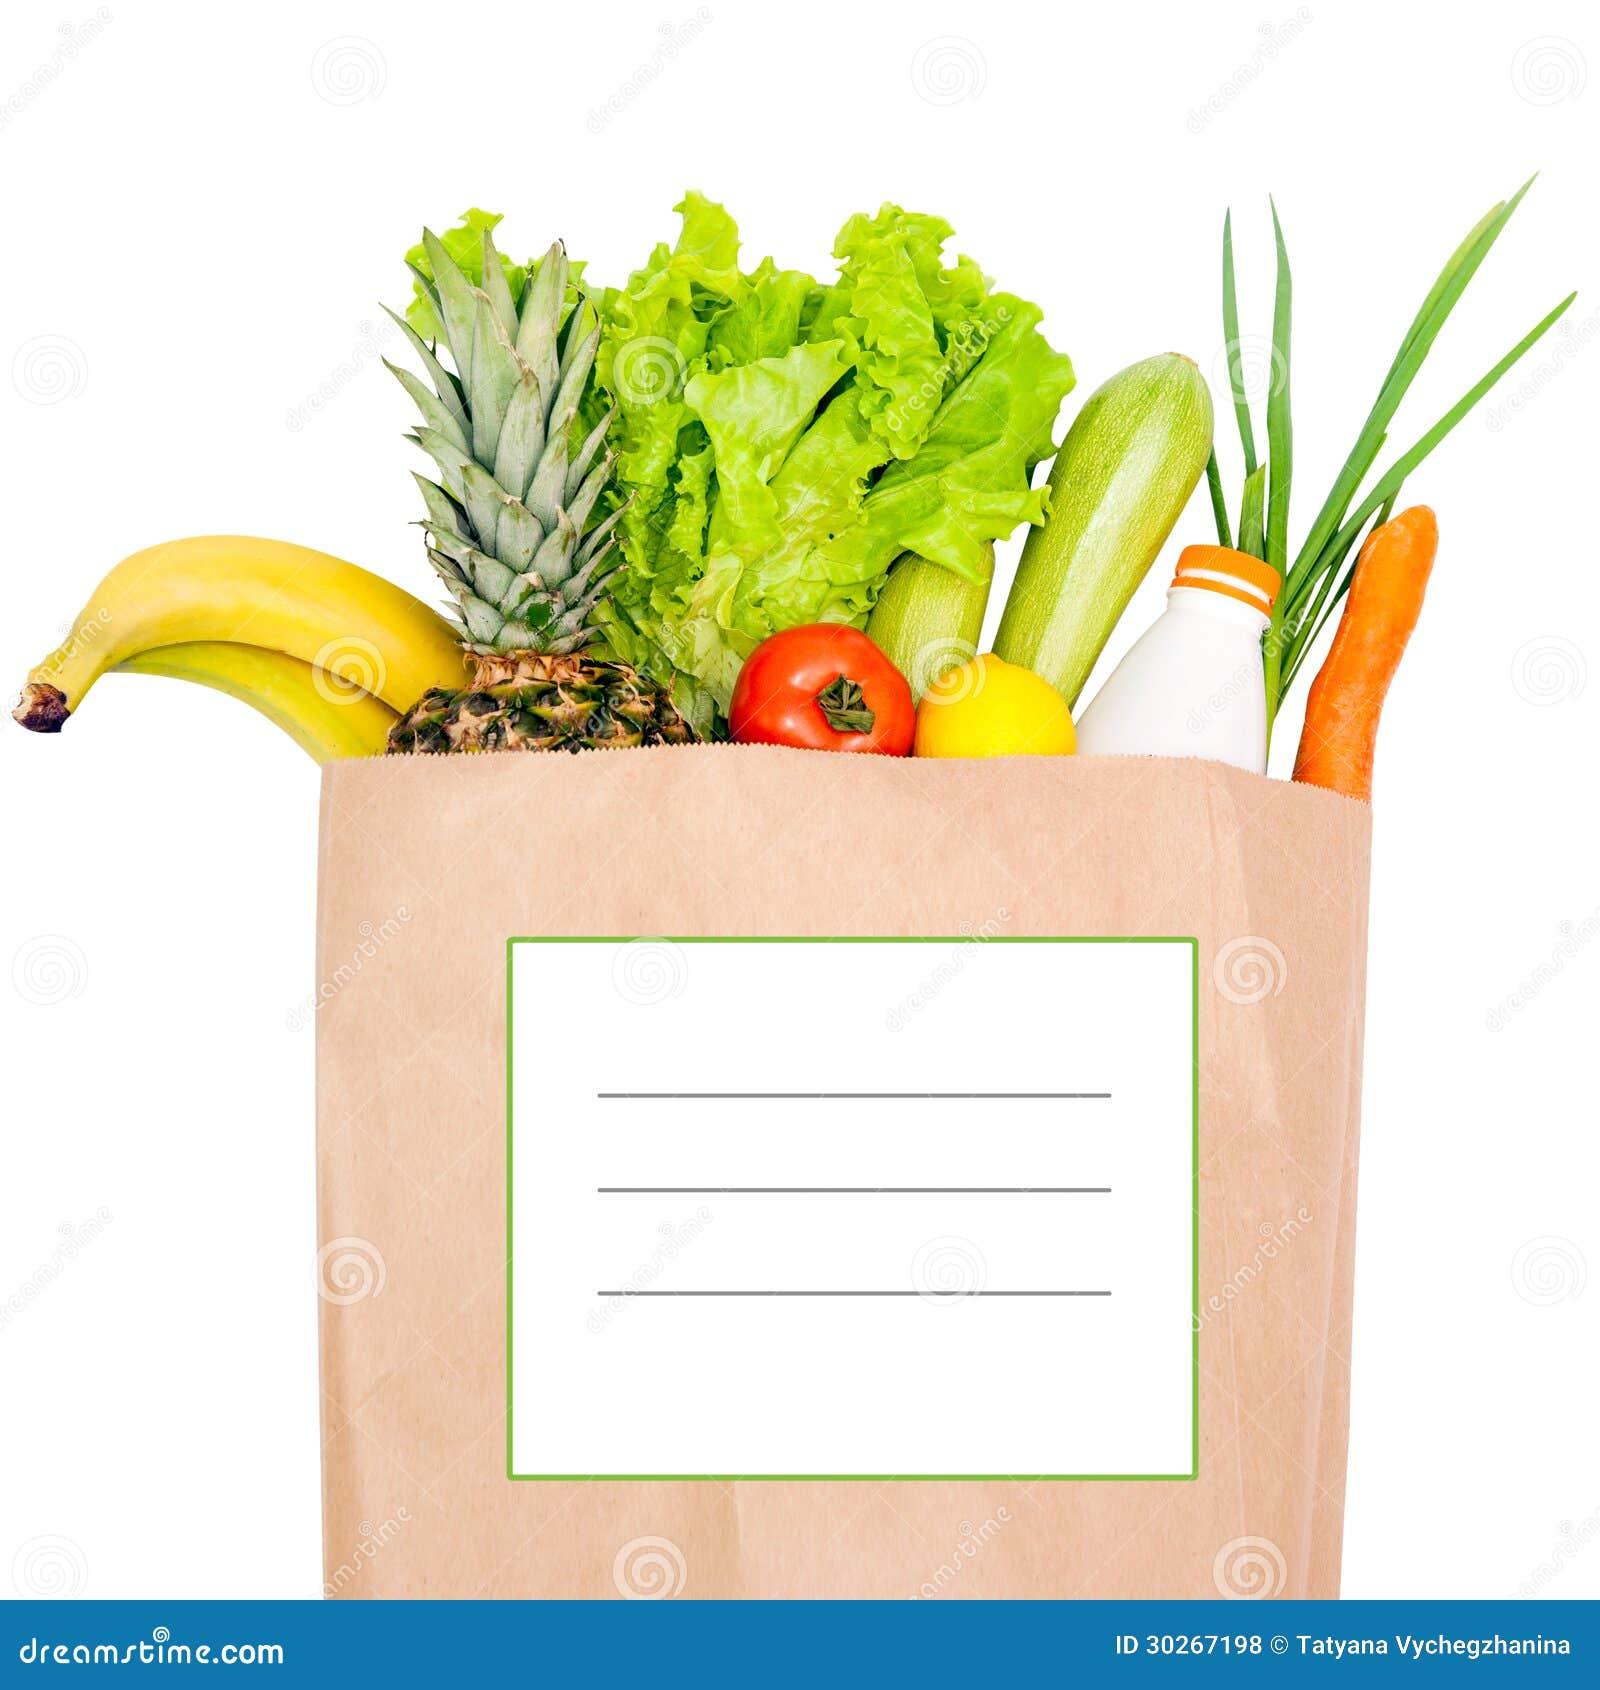 Eating Healthy Foods Essay